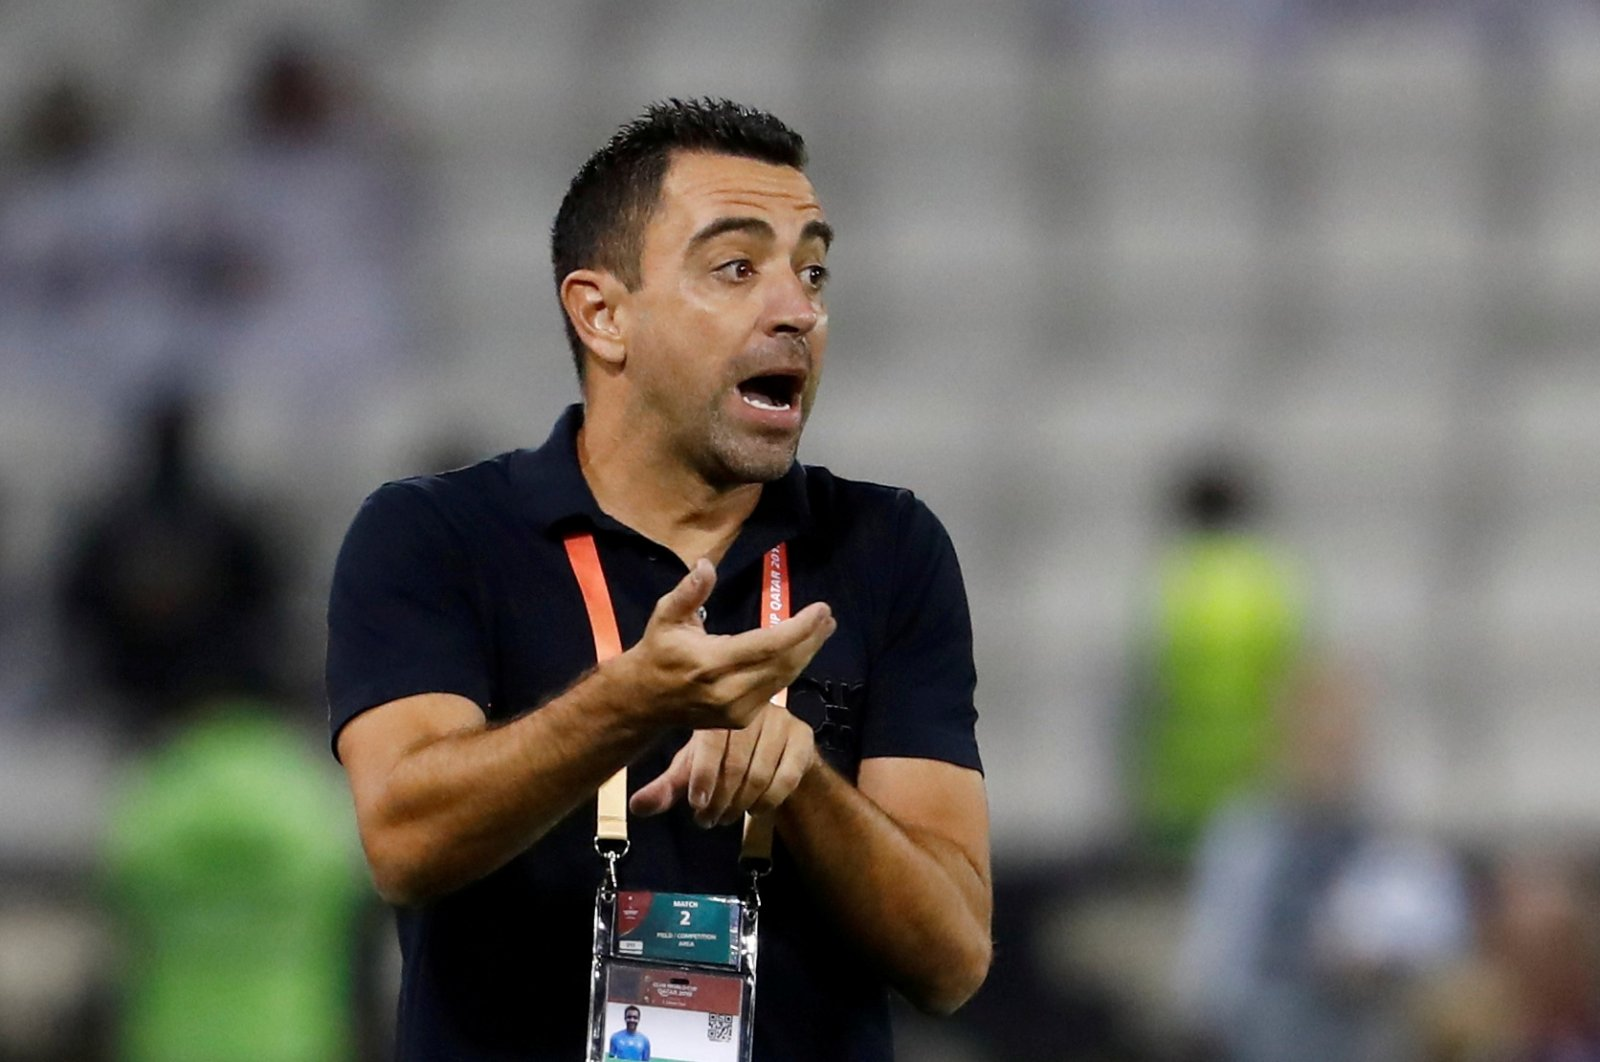 Al-Sadd coach Xavi Hernandez reacts during a match in Doha, Qatar, Dec. 14, 2019. (Reuters Photo)